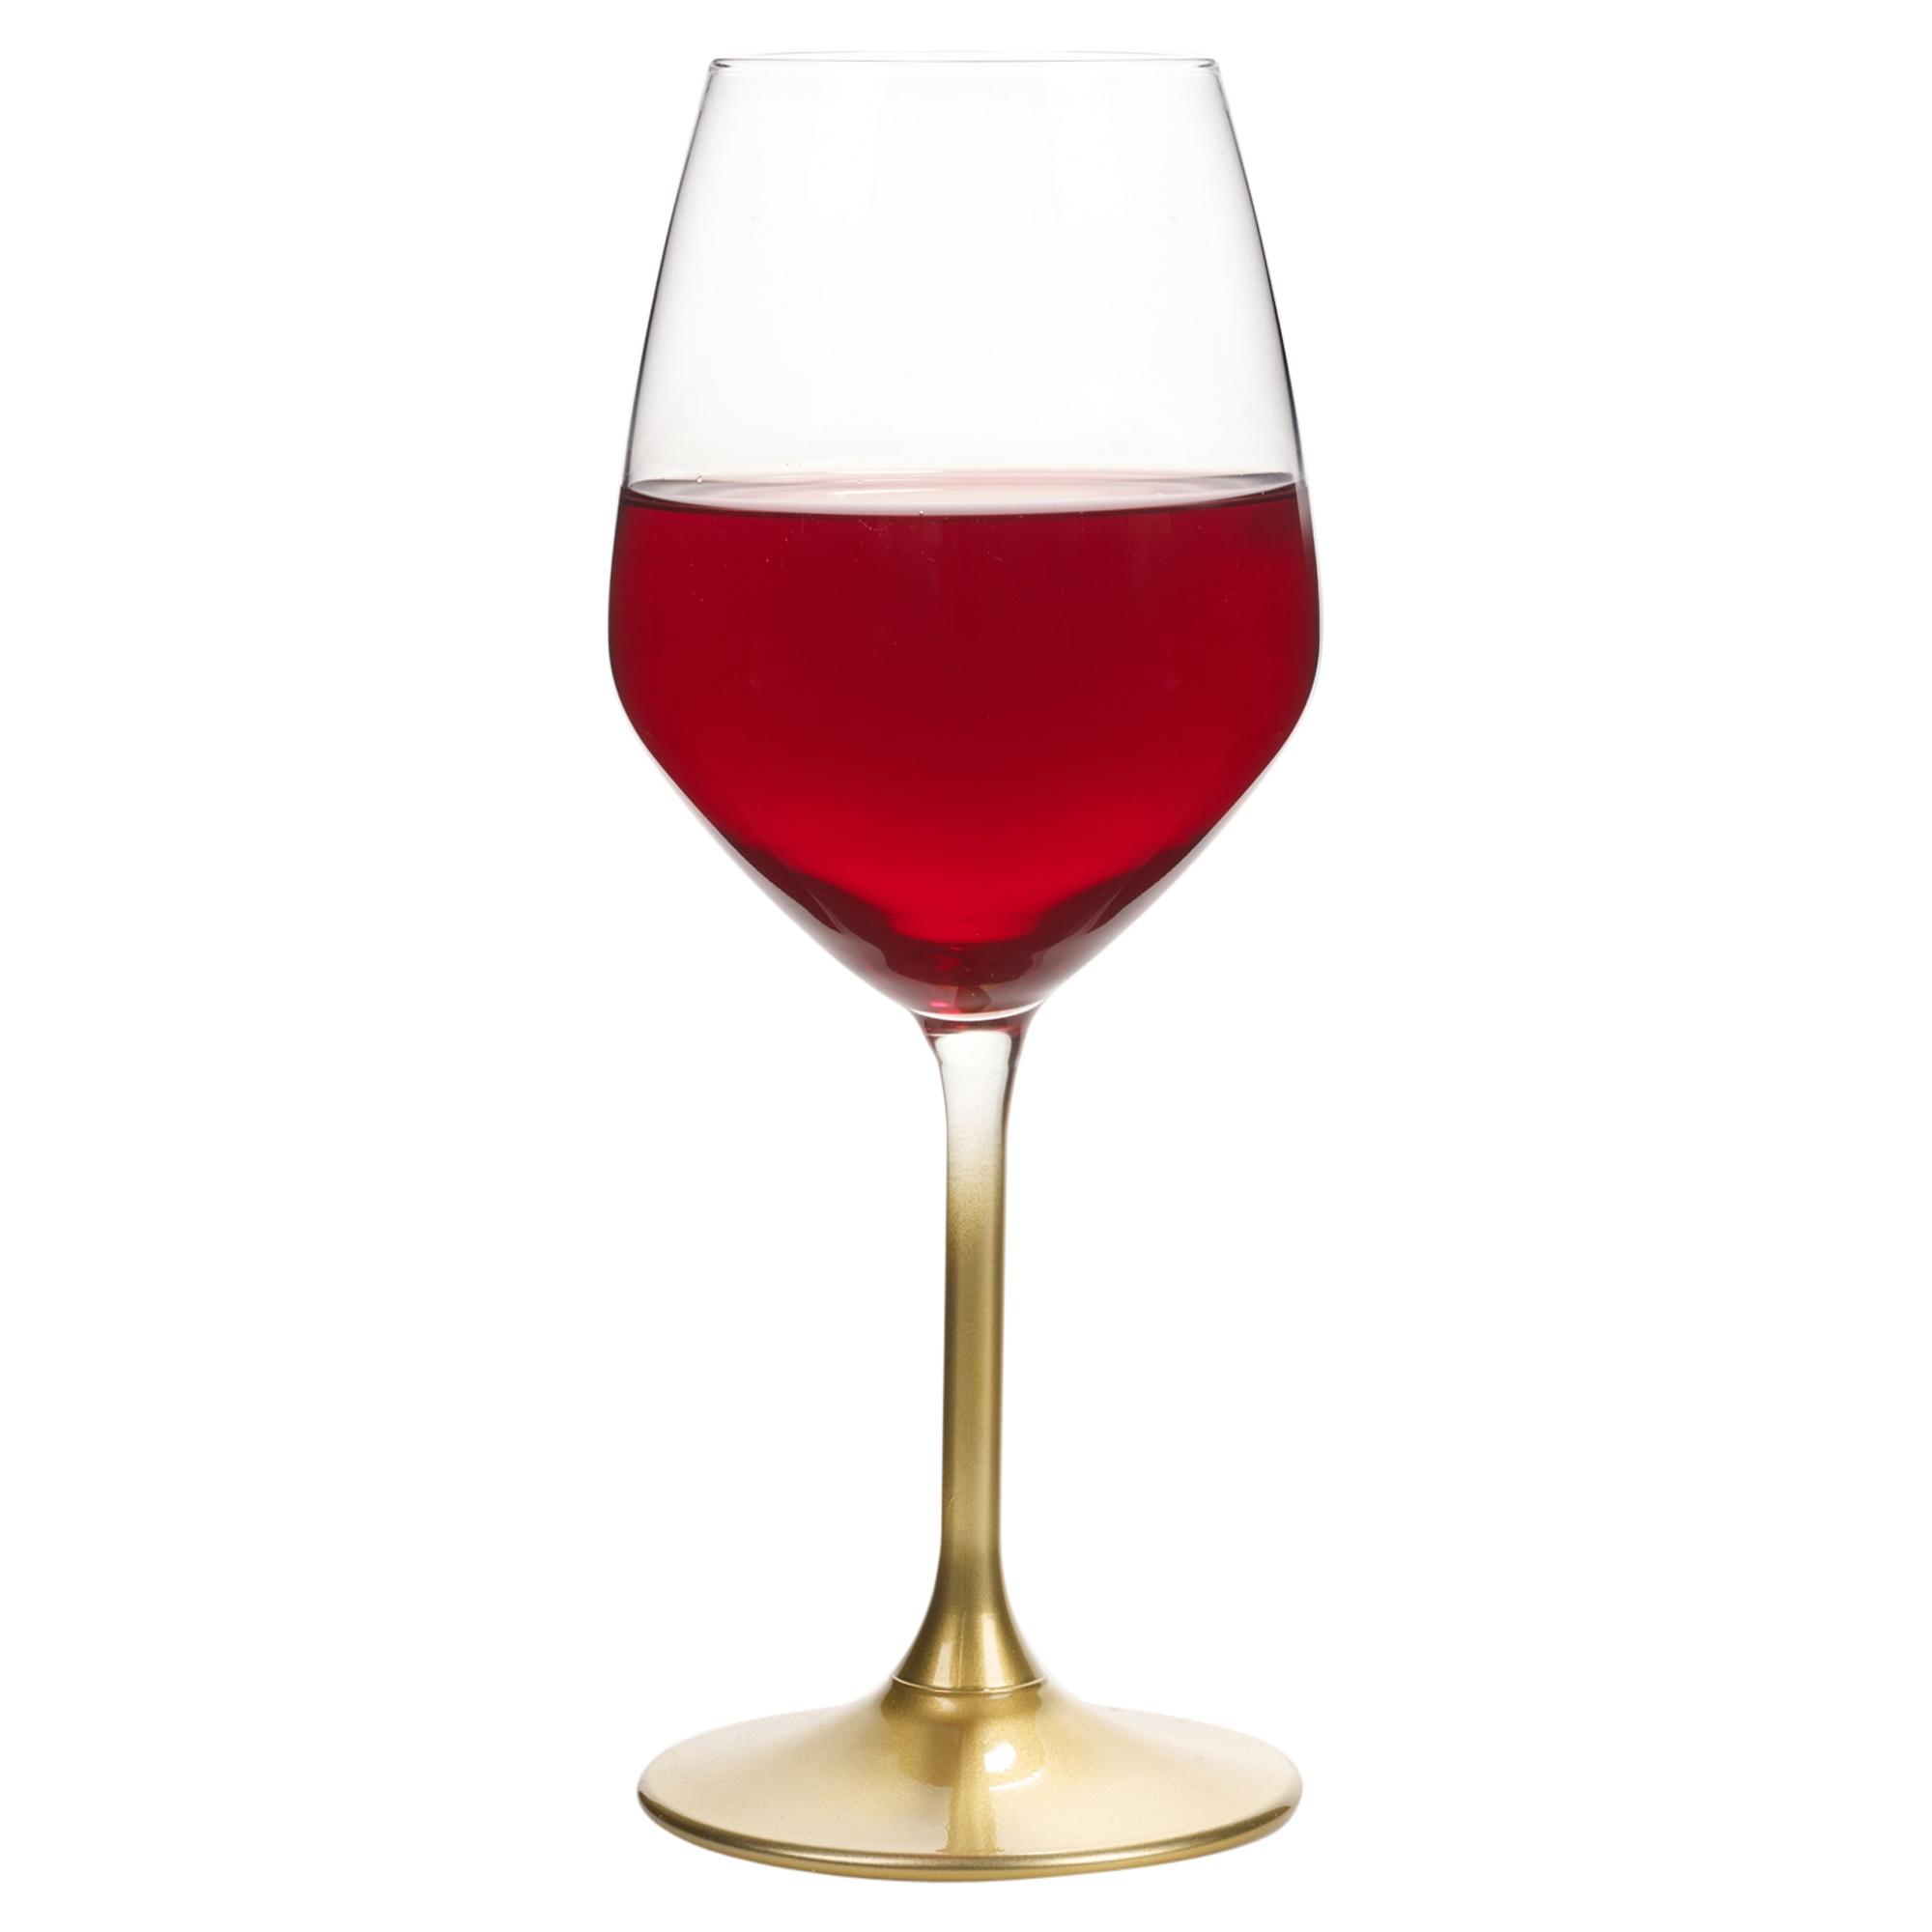 Bormioli Rocco Set of 4 Coloured Stem Wine Glasses Dinner  : 4 pcs bormioli rocco coloured stem wine glasses from www.ebay.co.uk size 2000 x 2000 jpeg 157kB